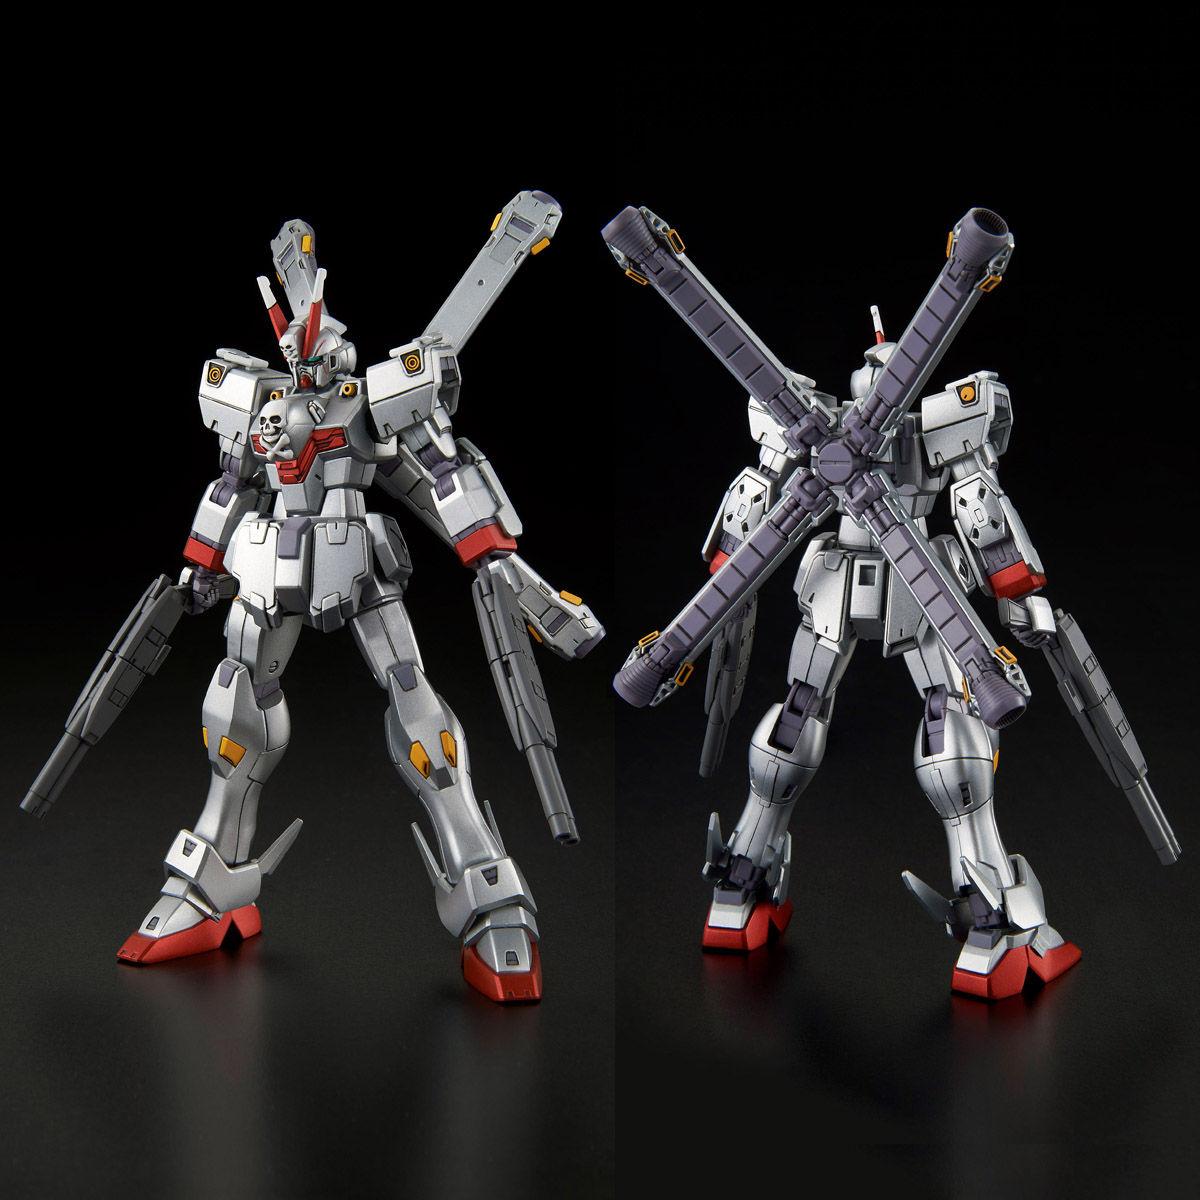 HGUC 1/144 XM-X0 クロスボーン・ガンダムX-0 [Crossbone Gundam X-0]